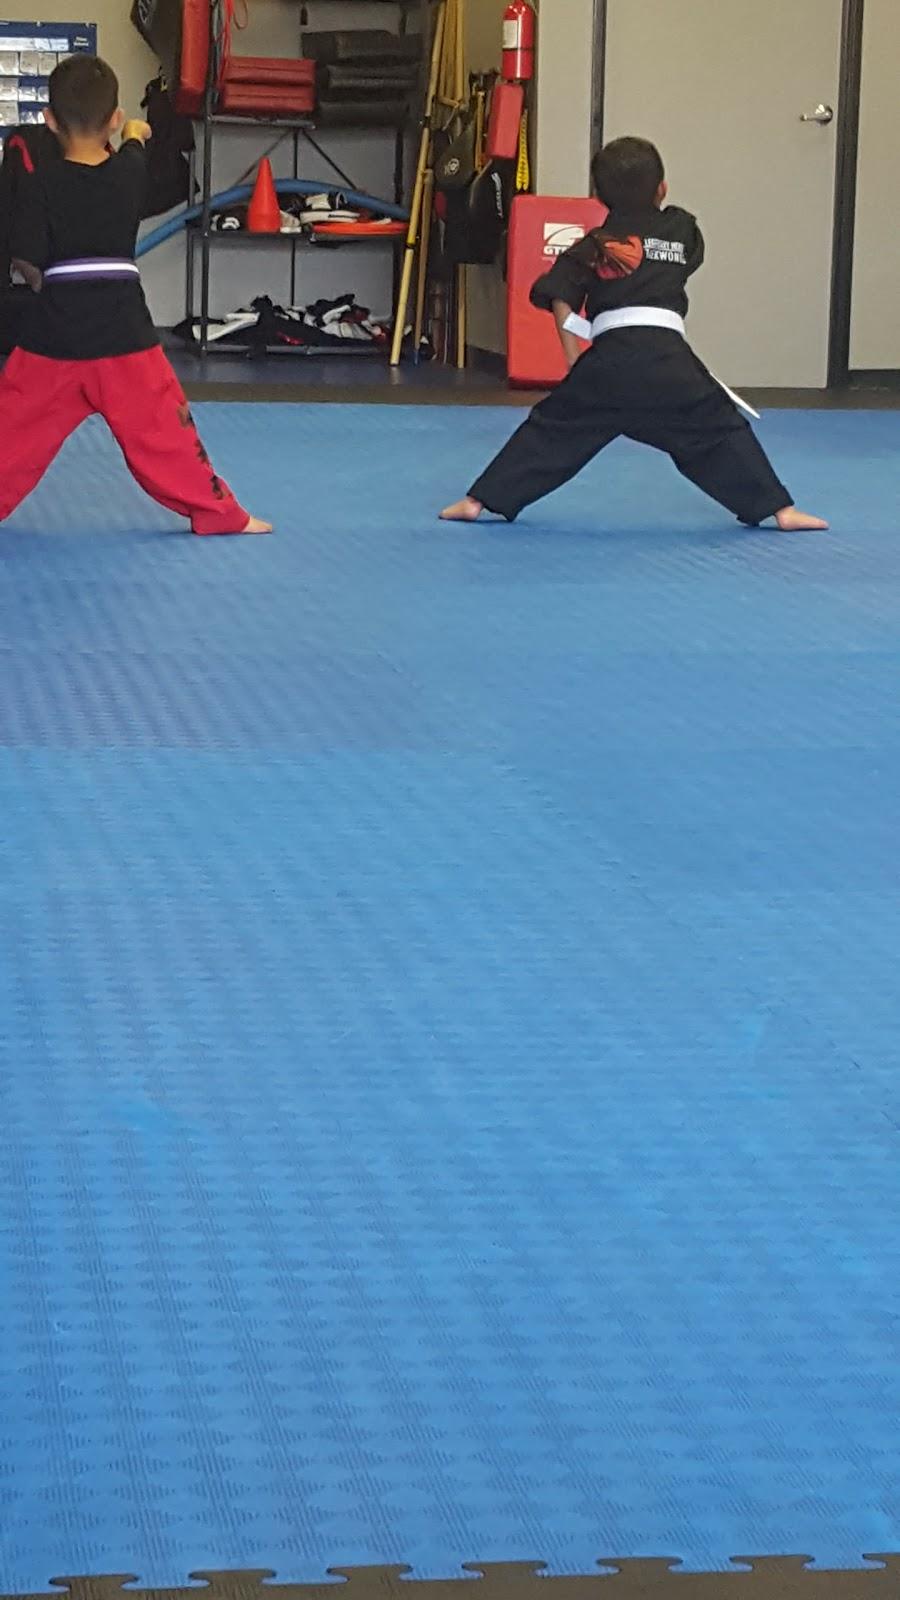 Legendary Heroes Taekwondo - health  | Photo 1 of 4 | Address: 14755 Foothill Blvd # F, Fontana, CA 92335, USA | Phone: (909) 237-5425